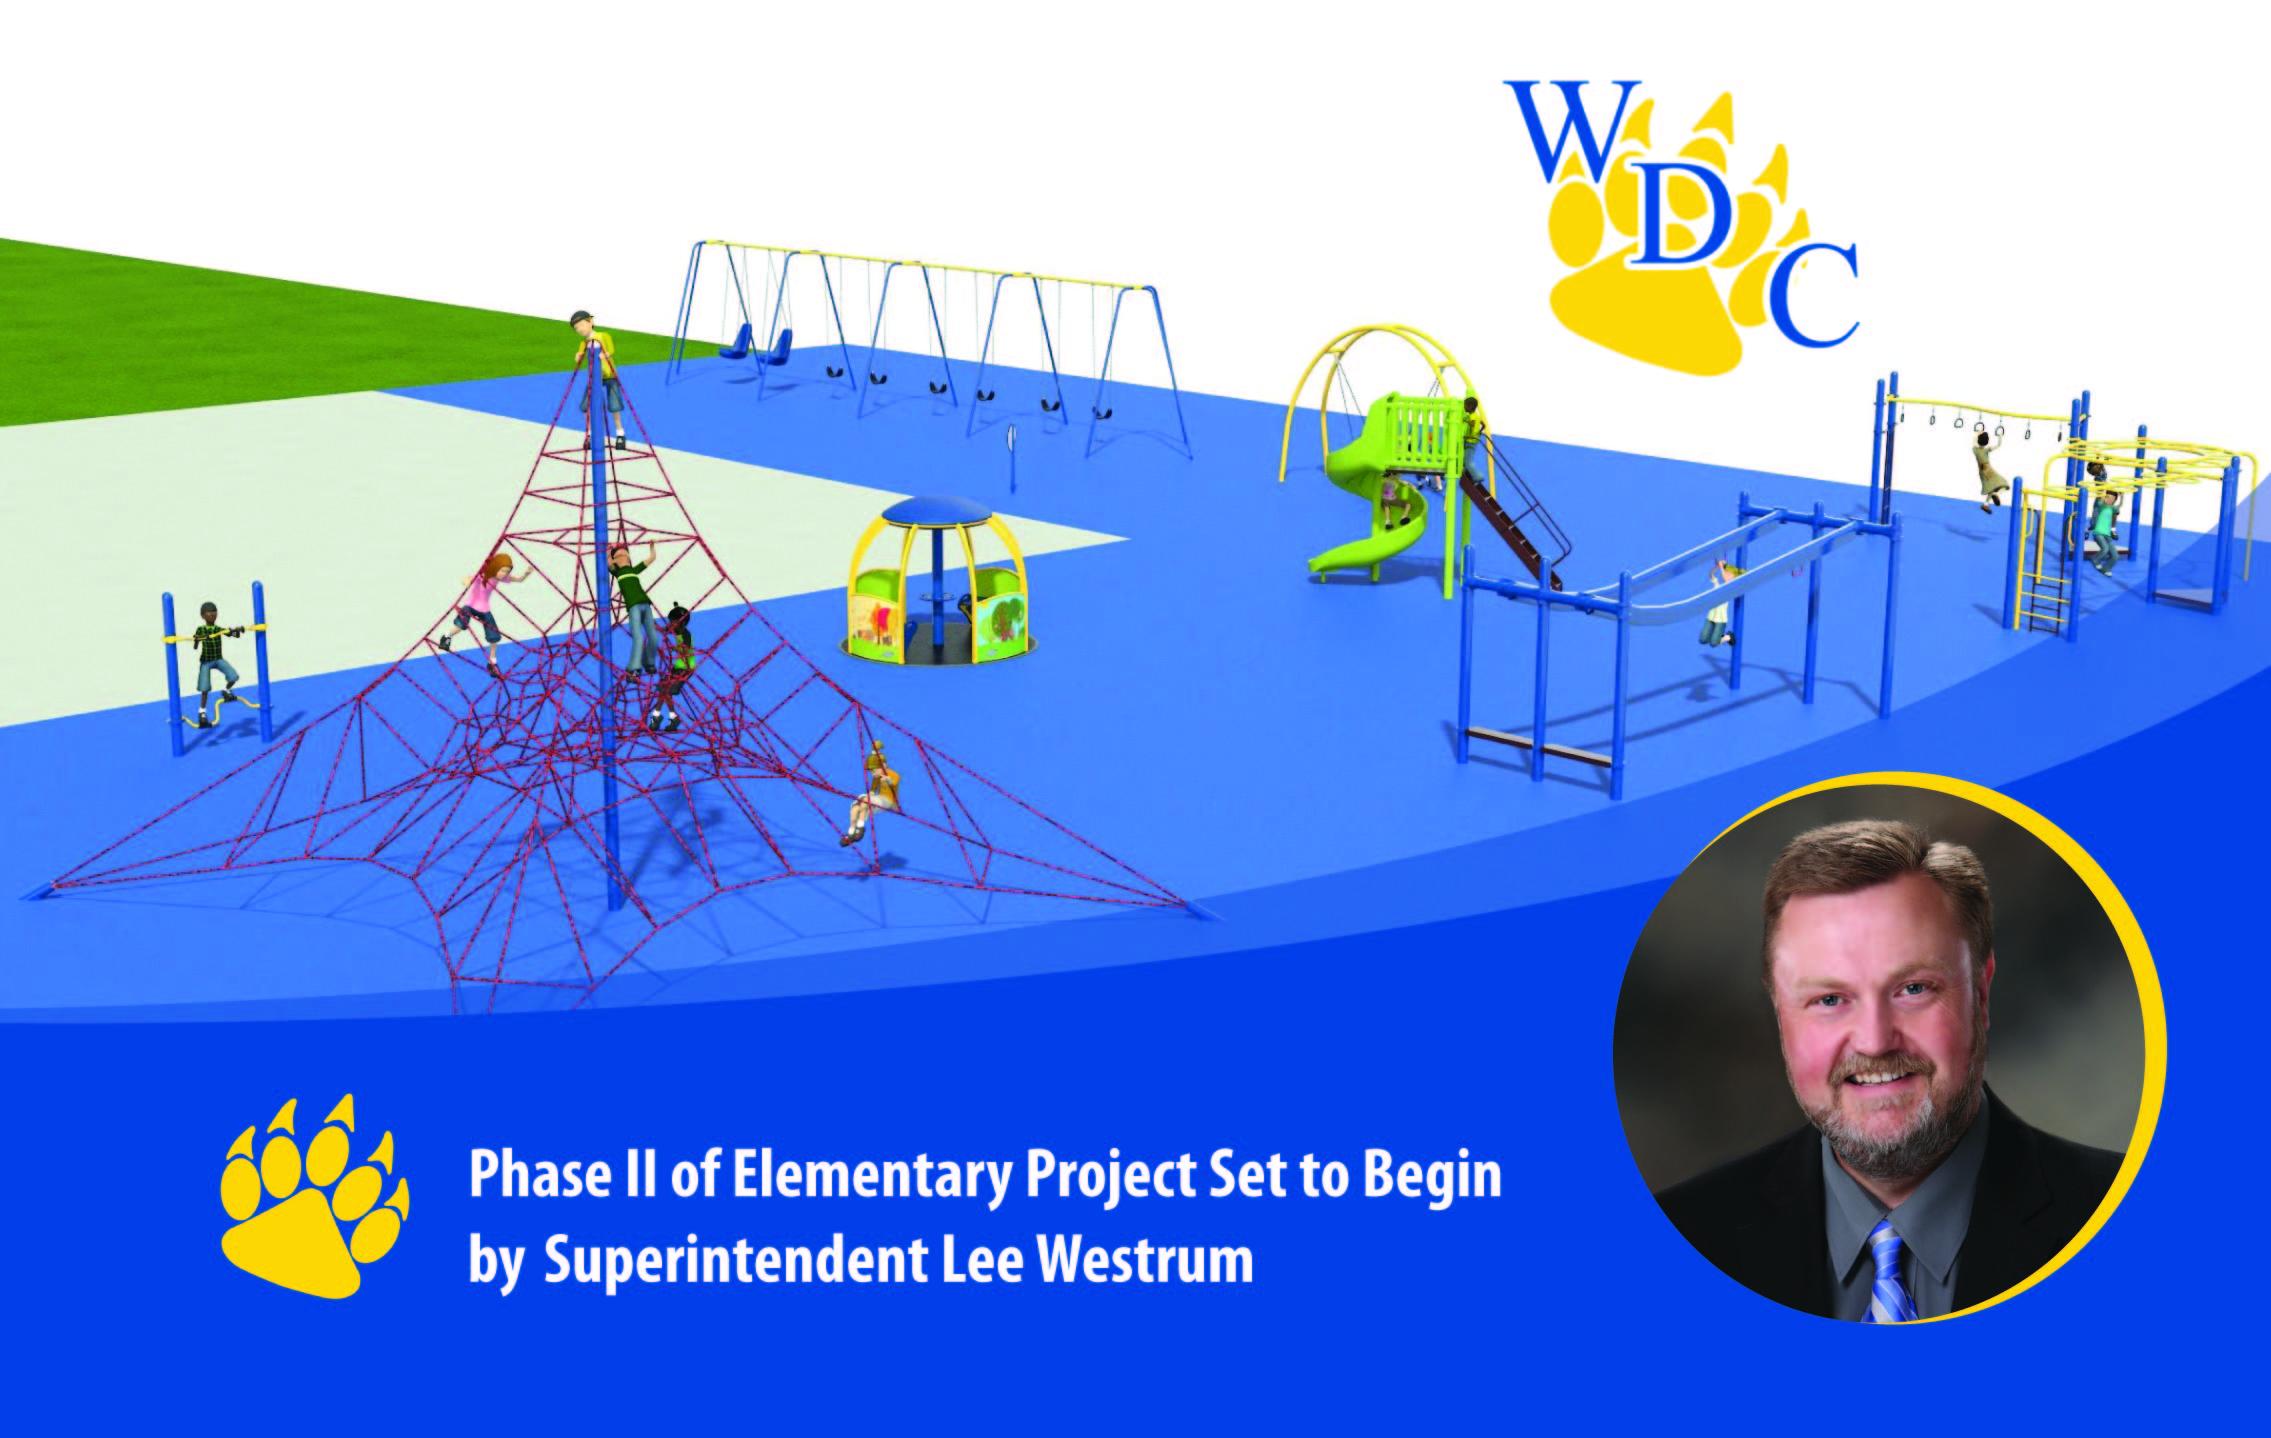 playground-redesign-01.jpg